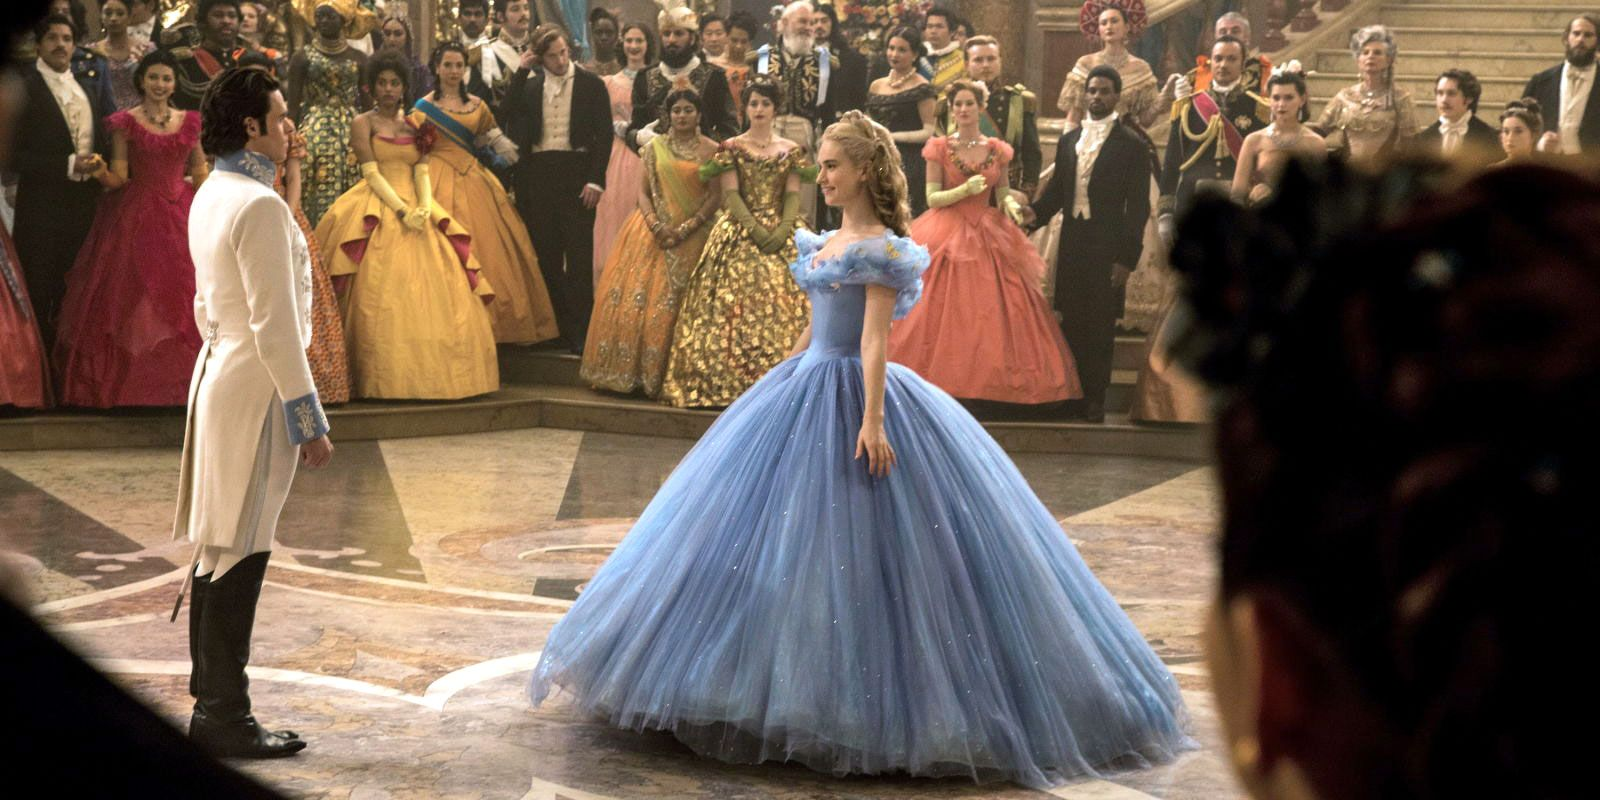 Cinderella Costume Designer On Corsets Actors Like Them